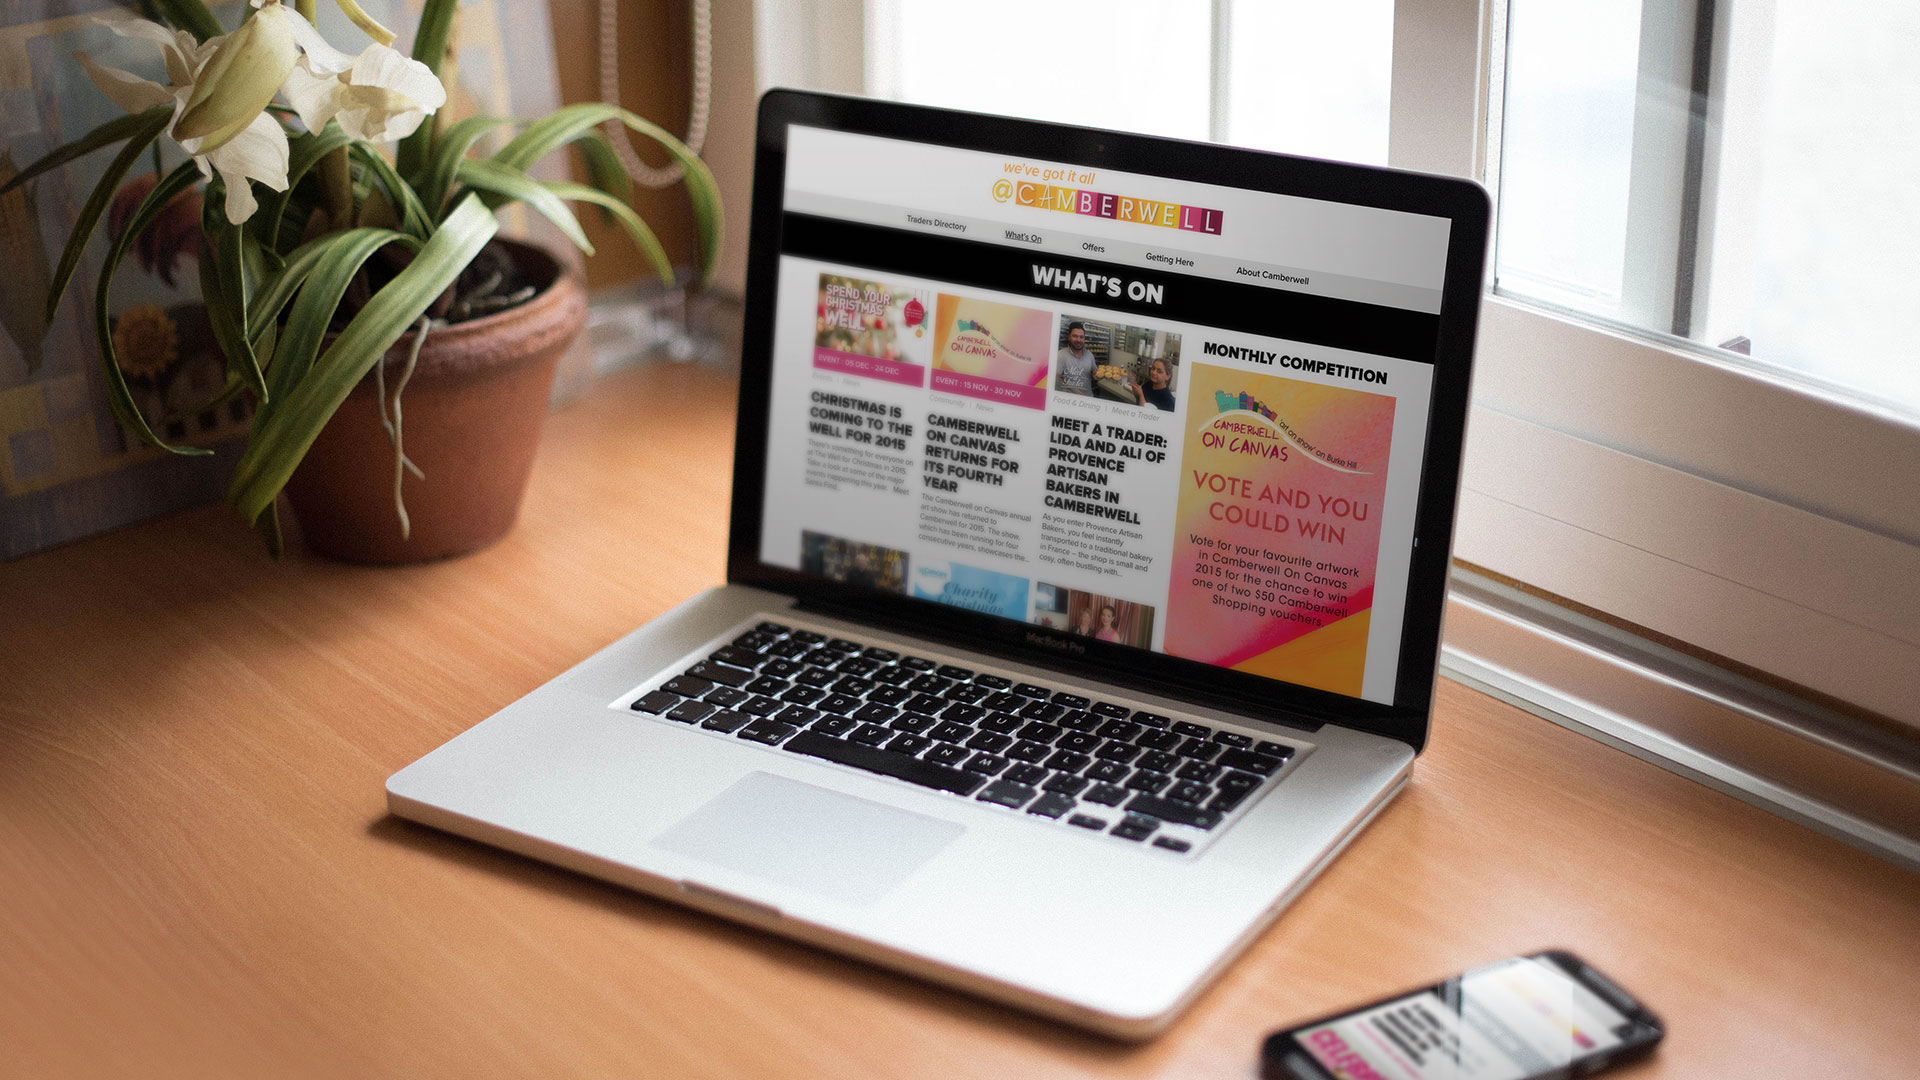 Camberwell website